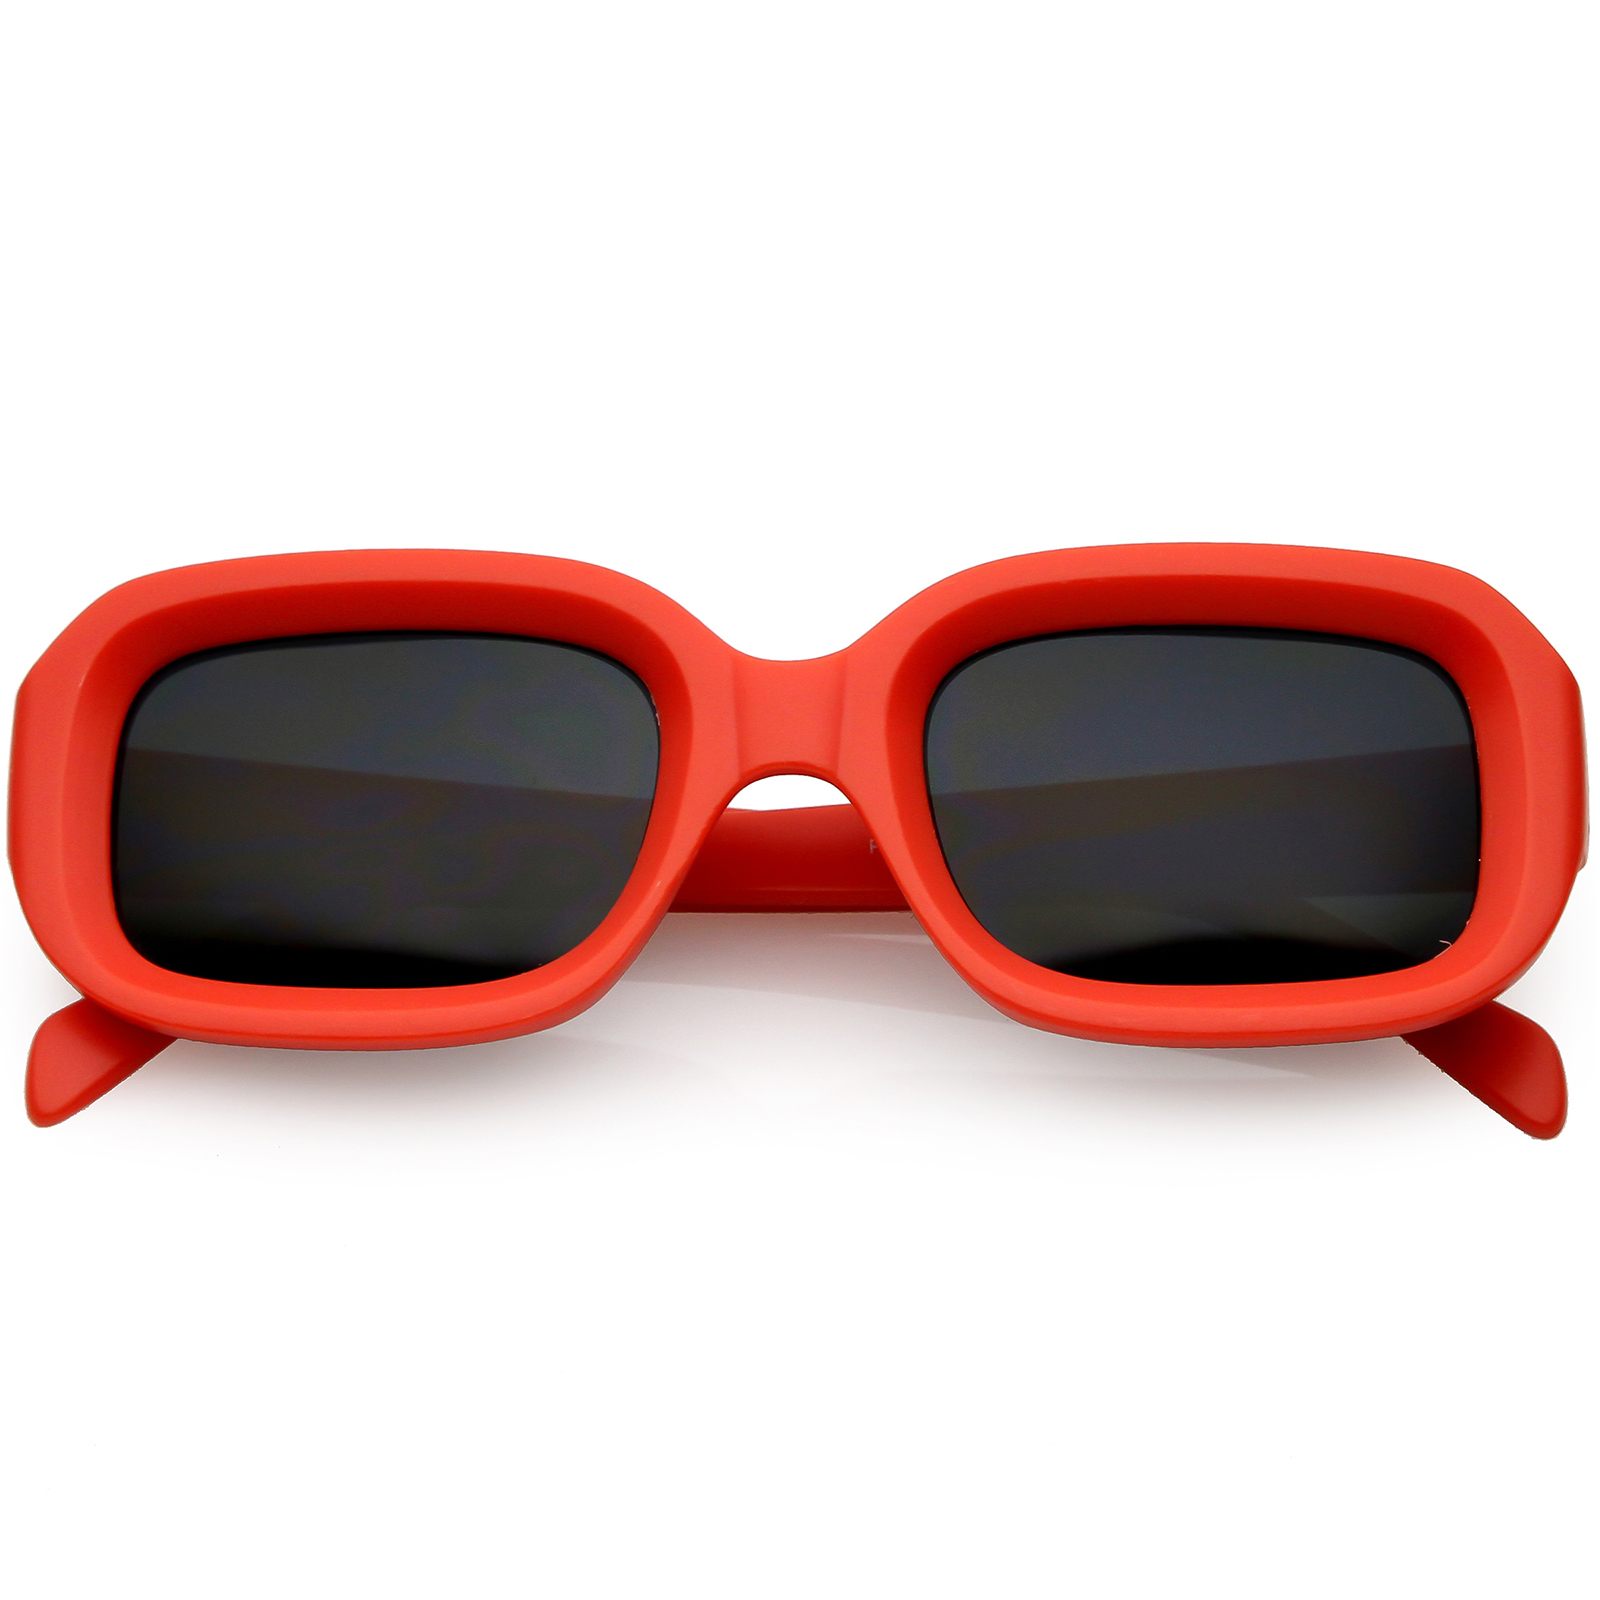 sunglassLA - Chunky Matte Finish Rectangle Sunglasses Neutral Colored Lens 50mm - 50mm